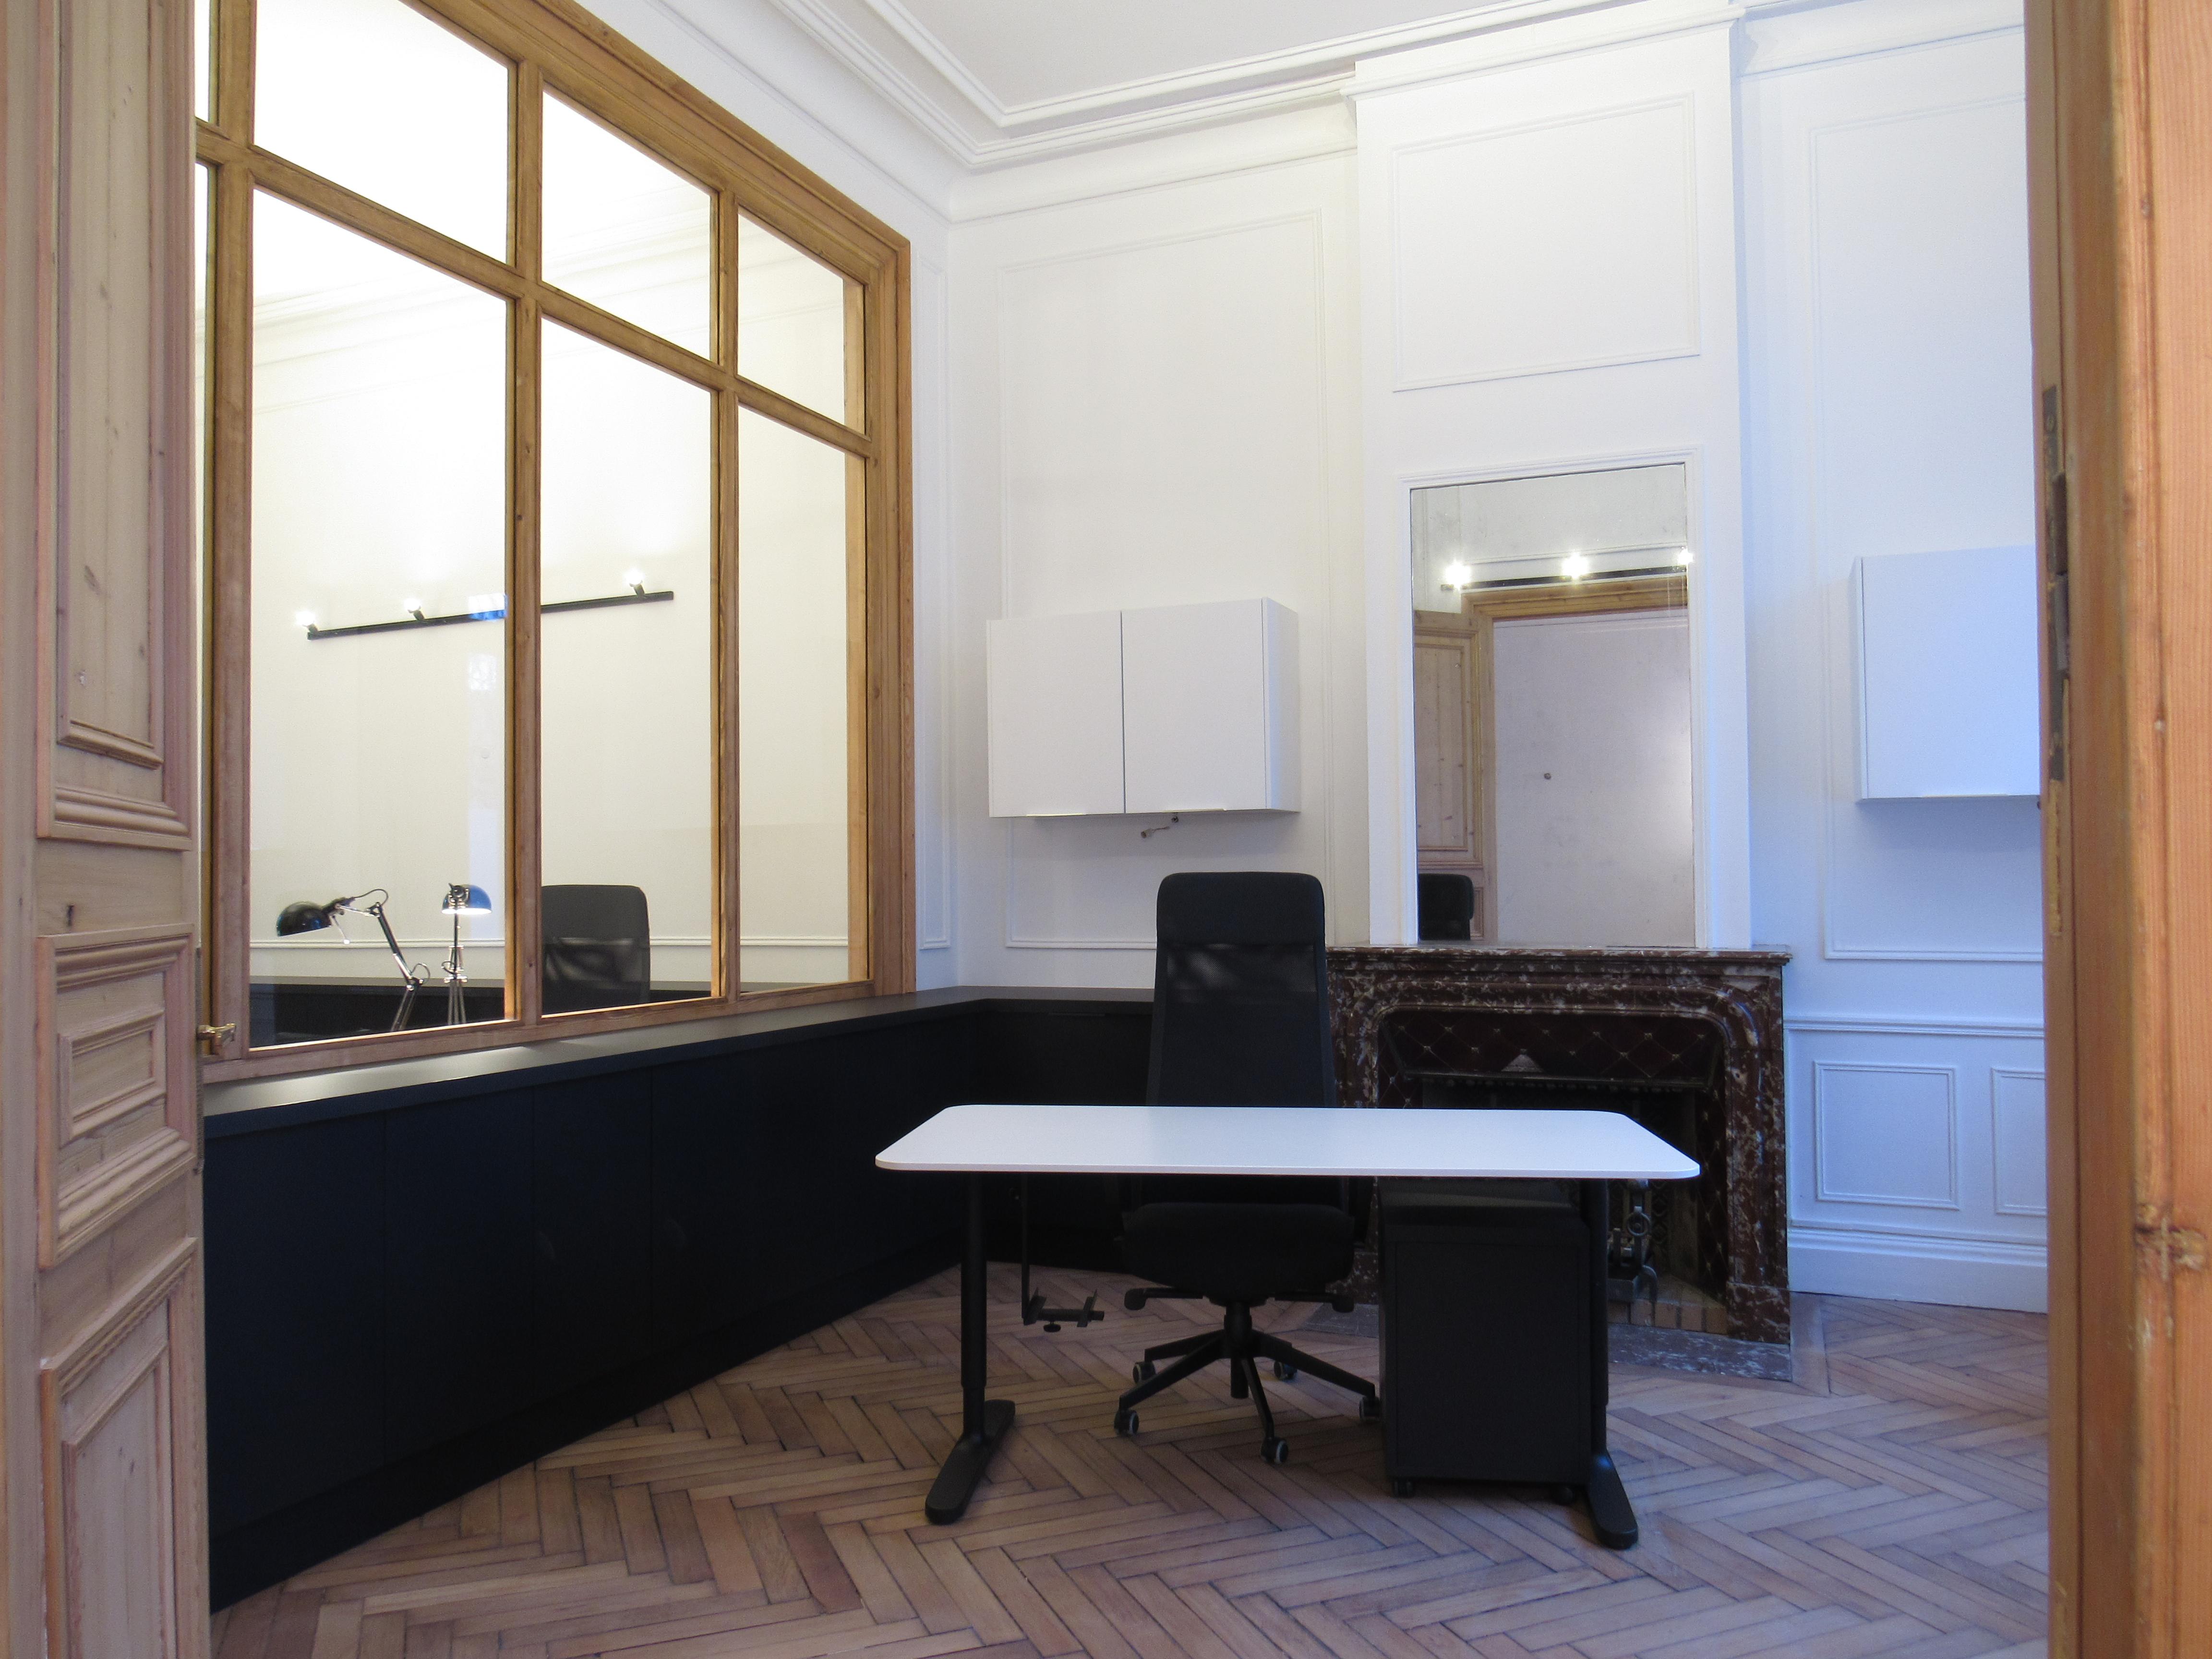 Bureau ikea zaventem bureau bureaux et tables chaises de bureau